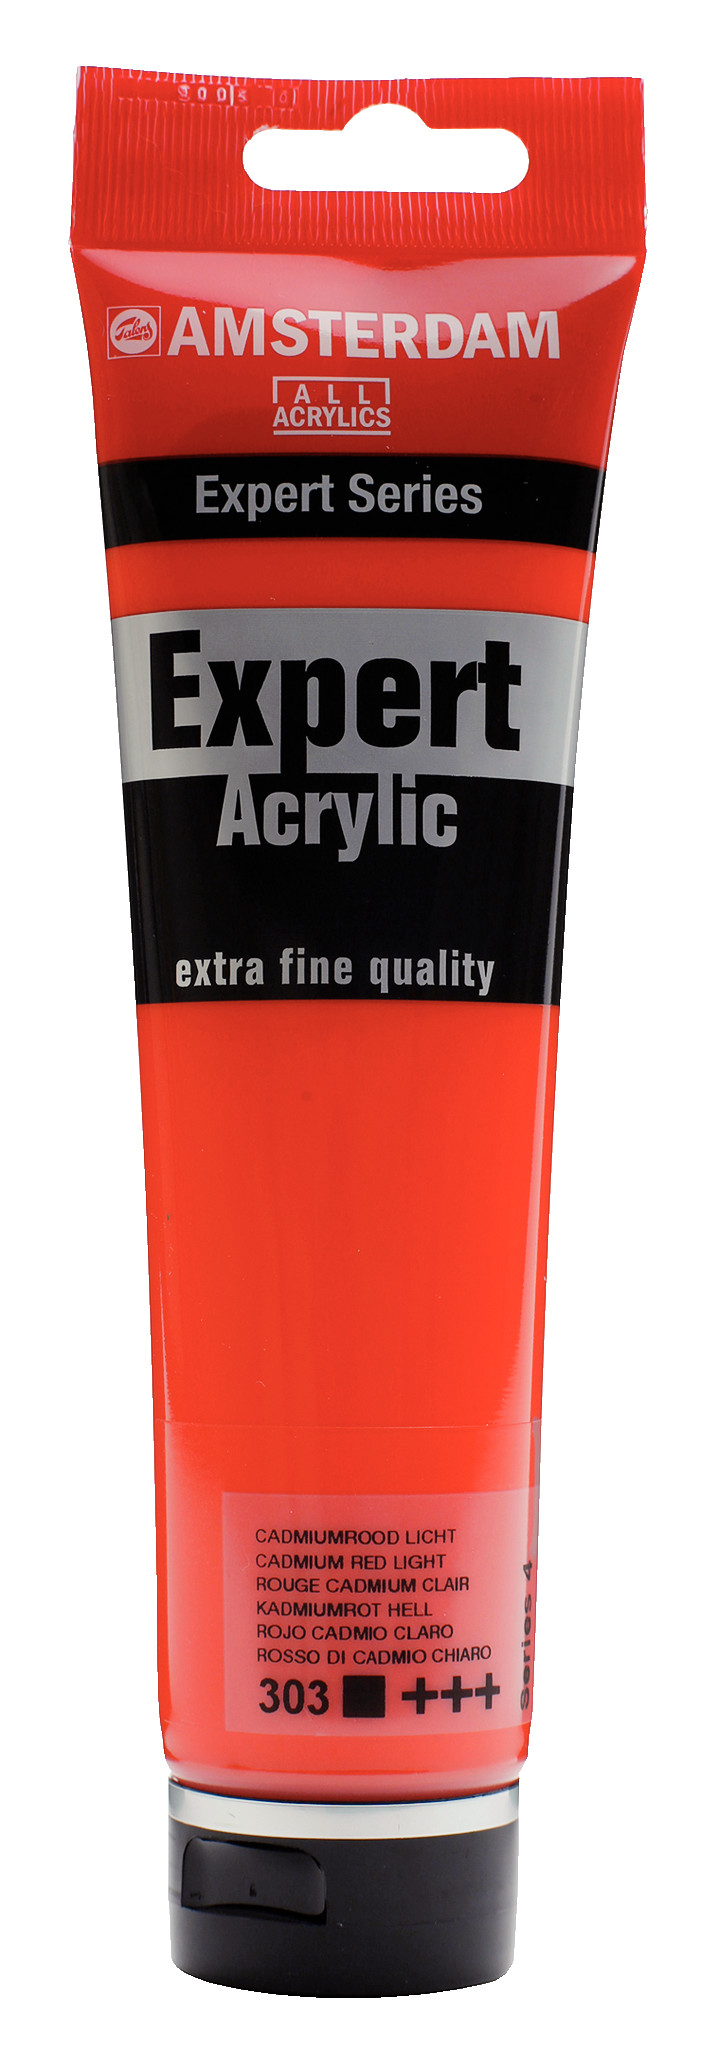 Amsterdam Expert Series Acrylic Tube 150 ml Cadmium Red Light 303